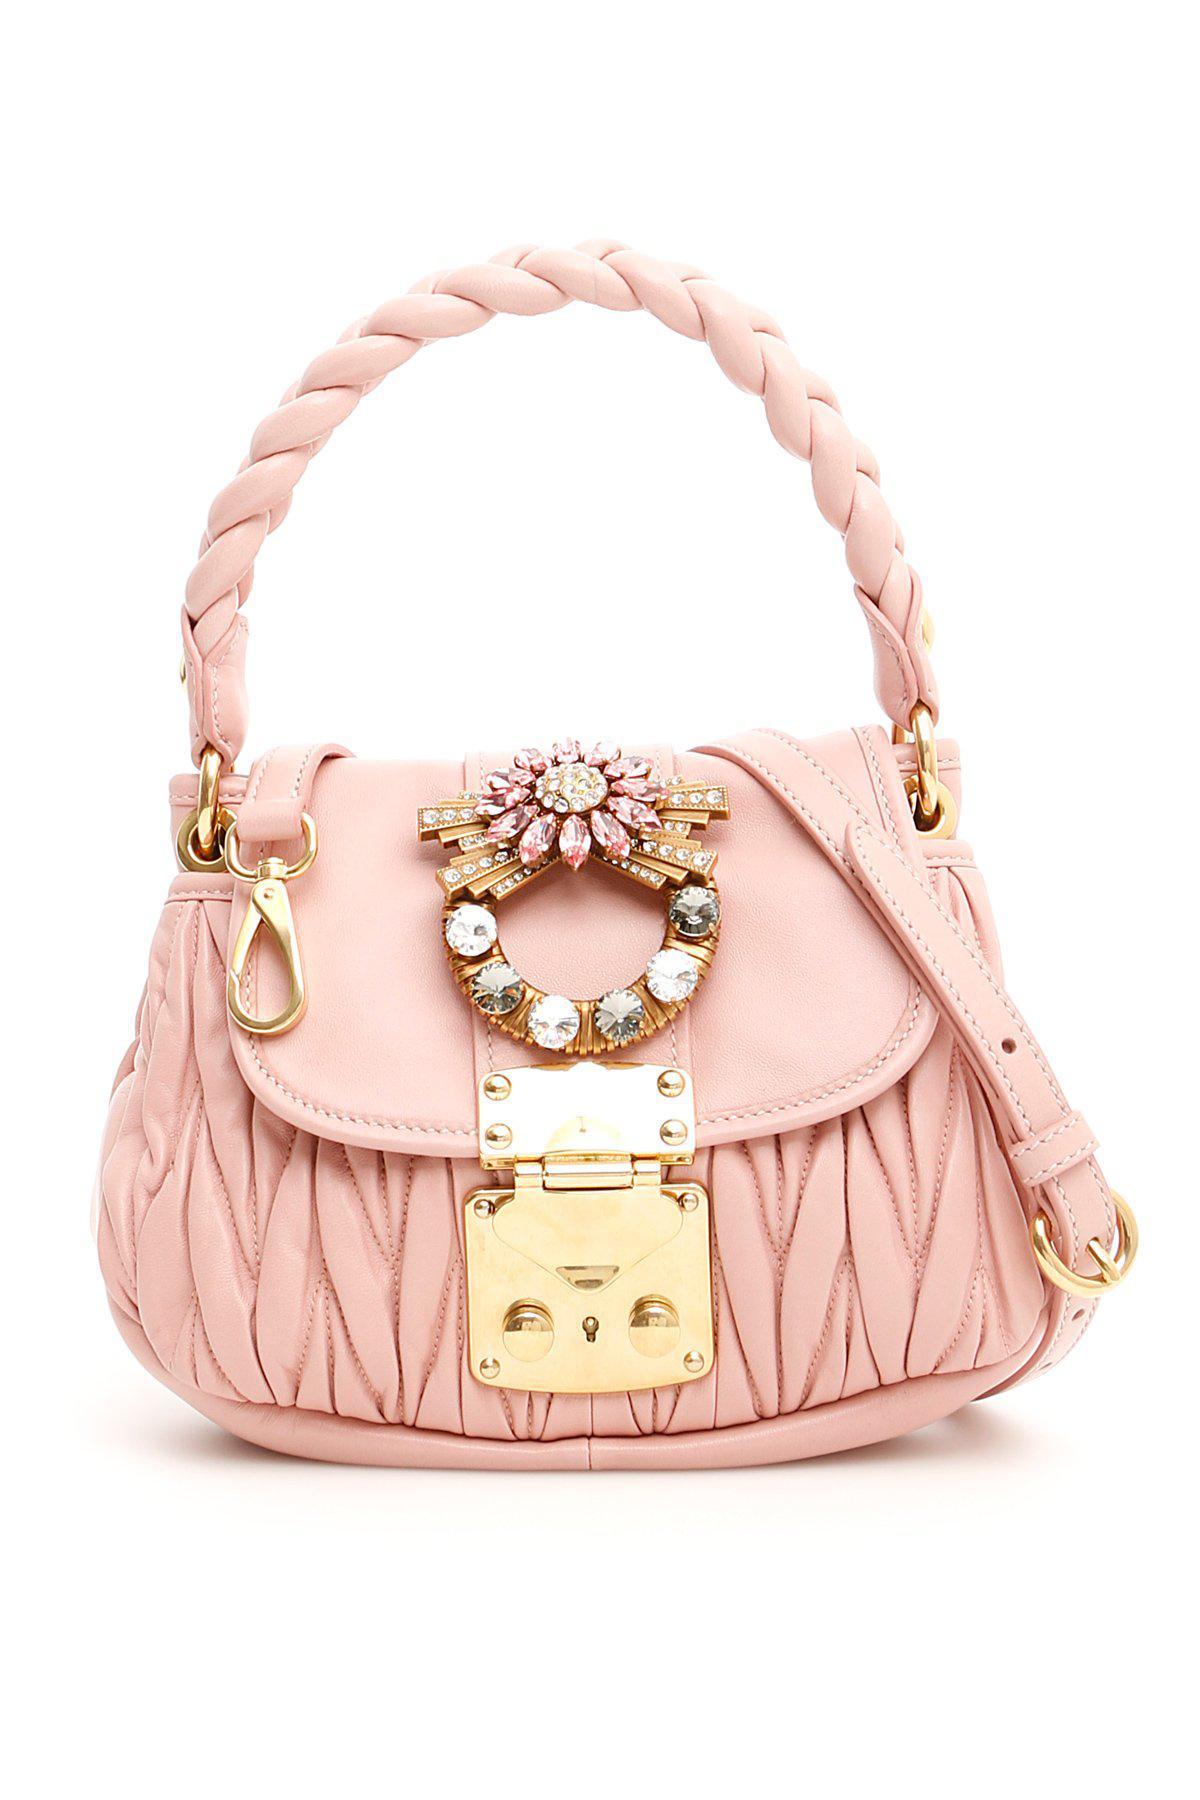 38096b2a0b70 Lyst - Miu Miu Mini Embellished Matelassé Tote Bag in Pink